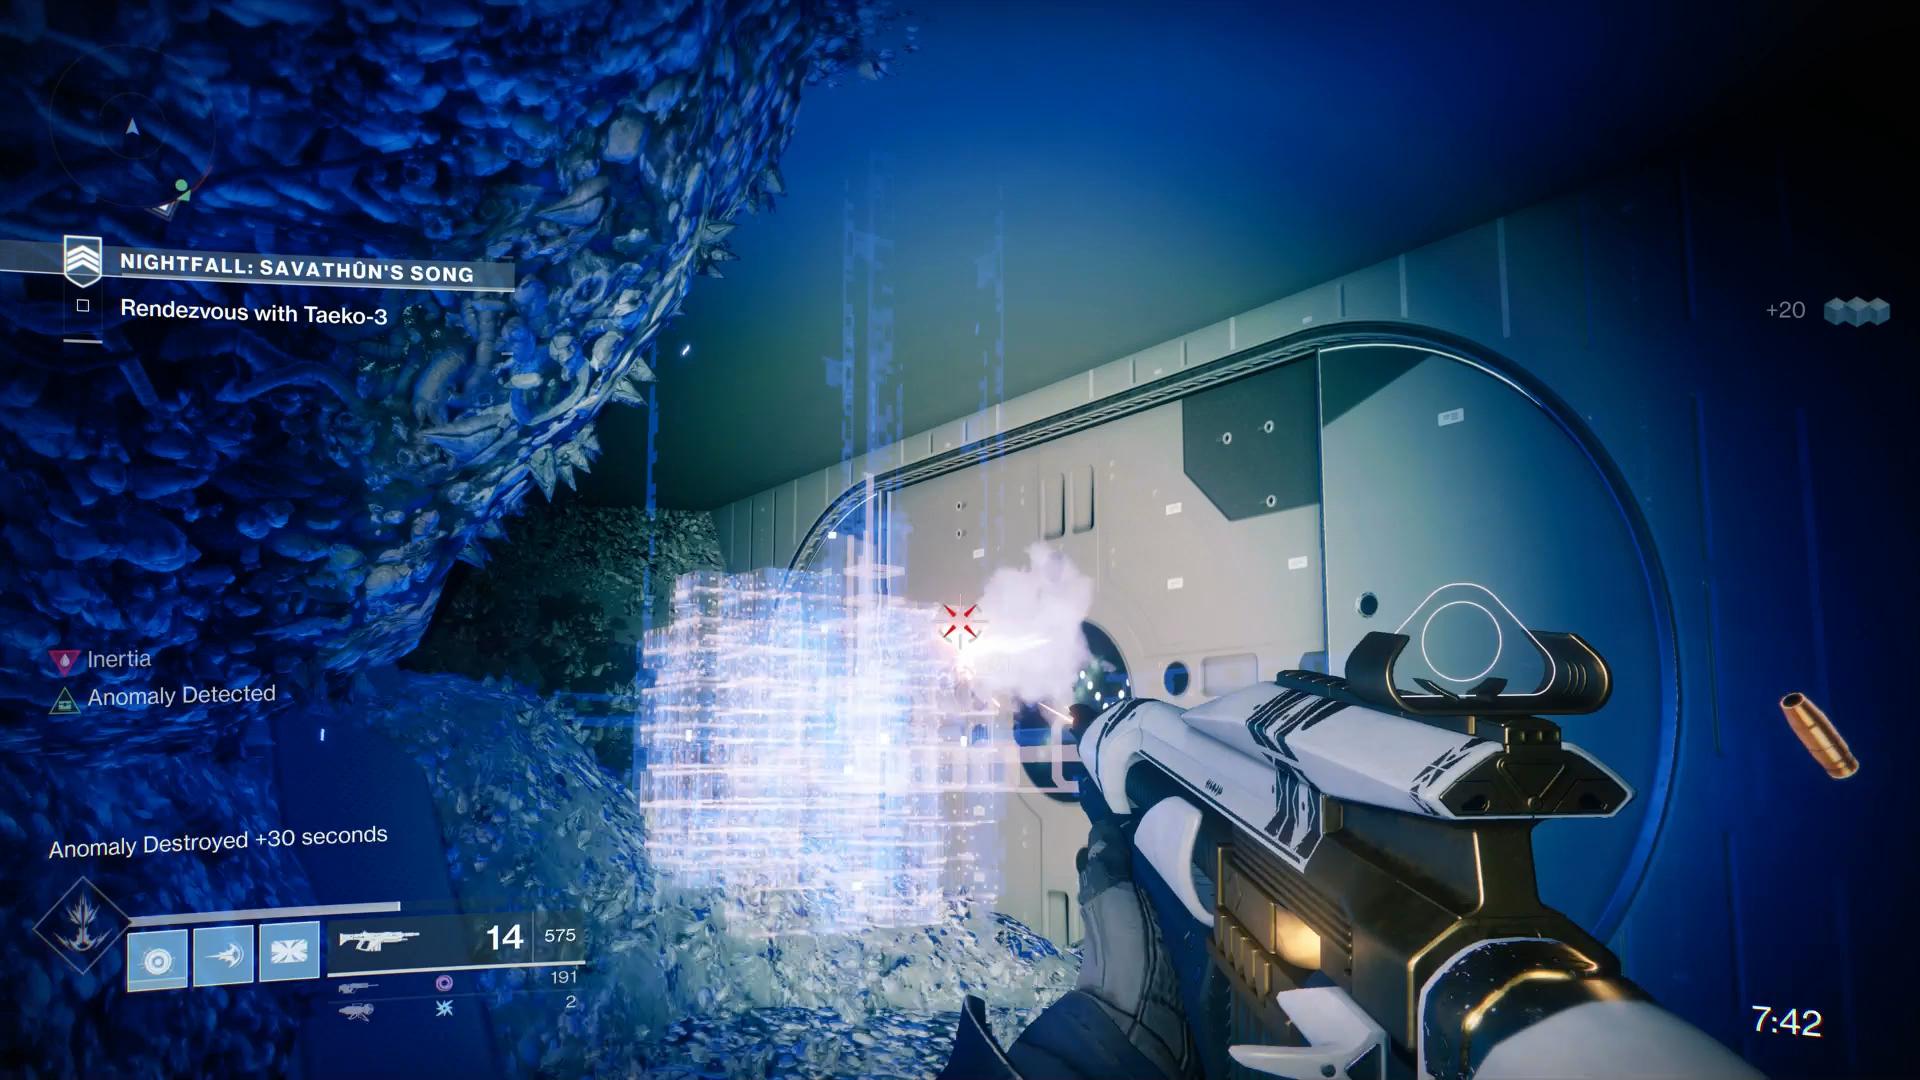 Destiny 2 guide: Savathun's Song Nightfall walkthrough